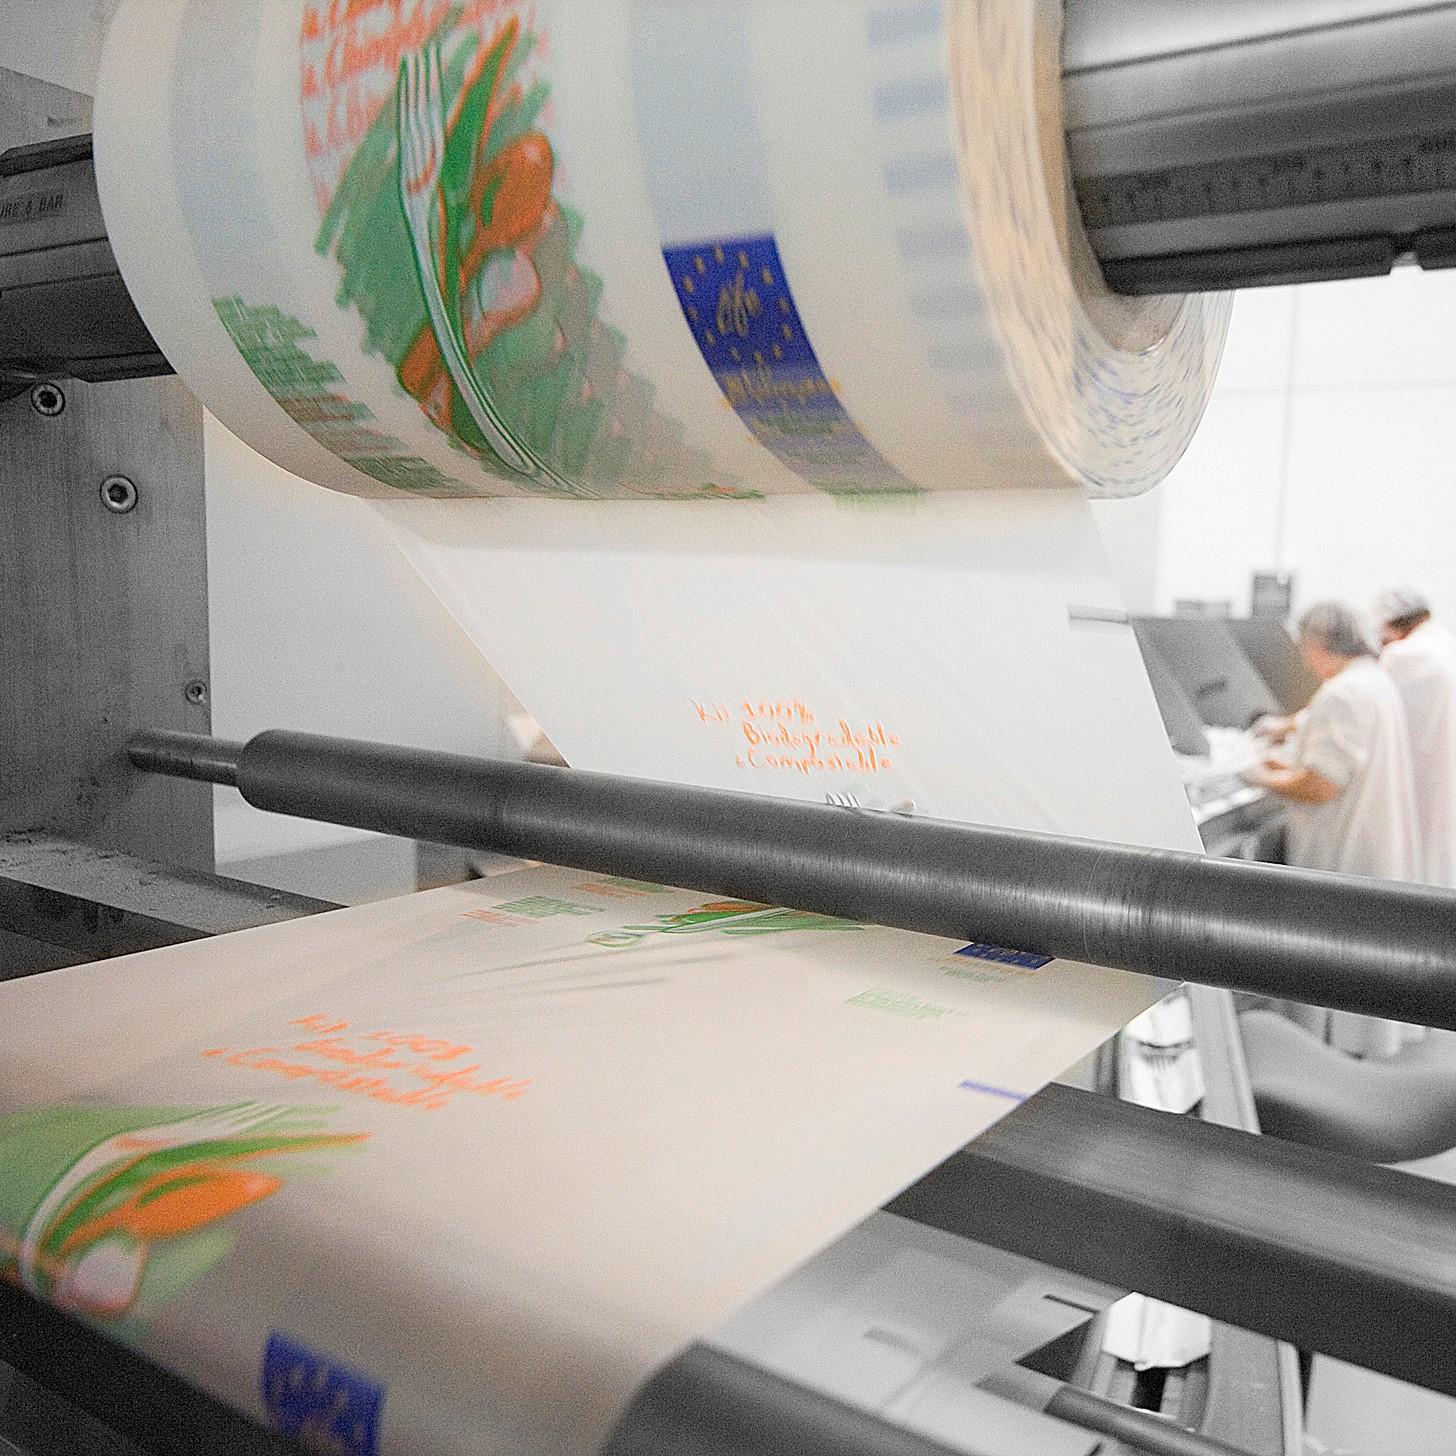 Bioplastics rivals BASF and Novamont unveil compostable cling films in fundamental breakthroughs